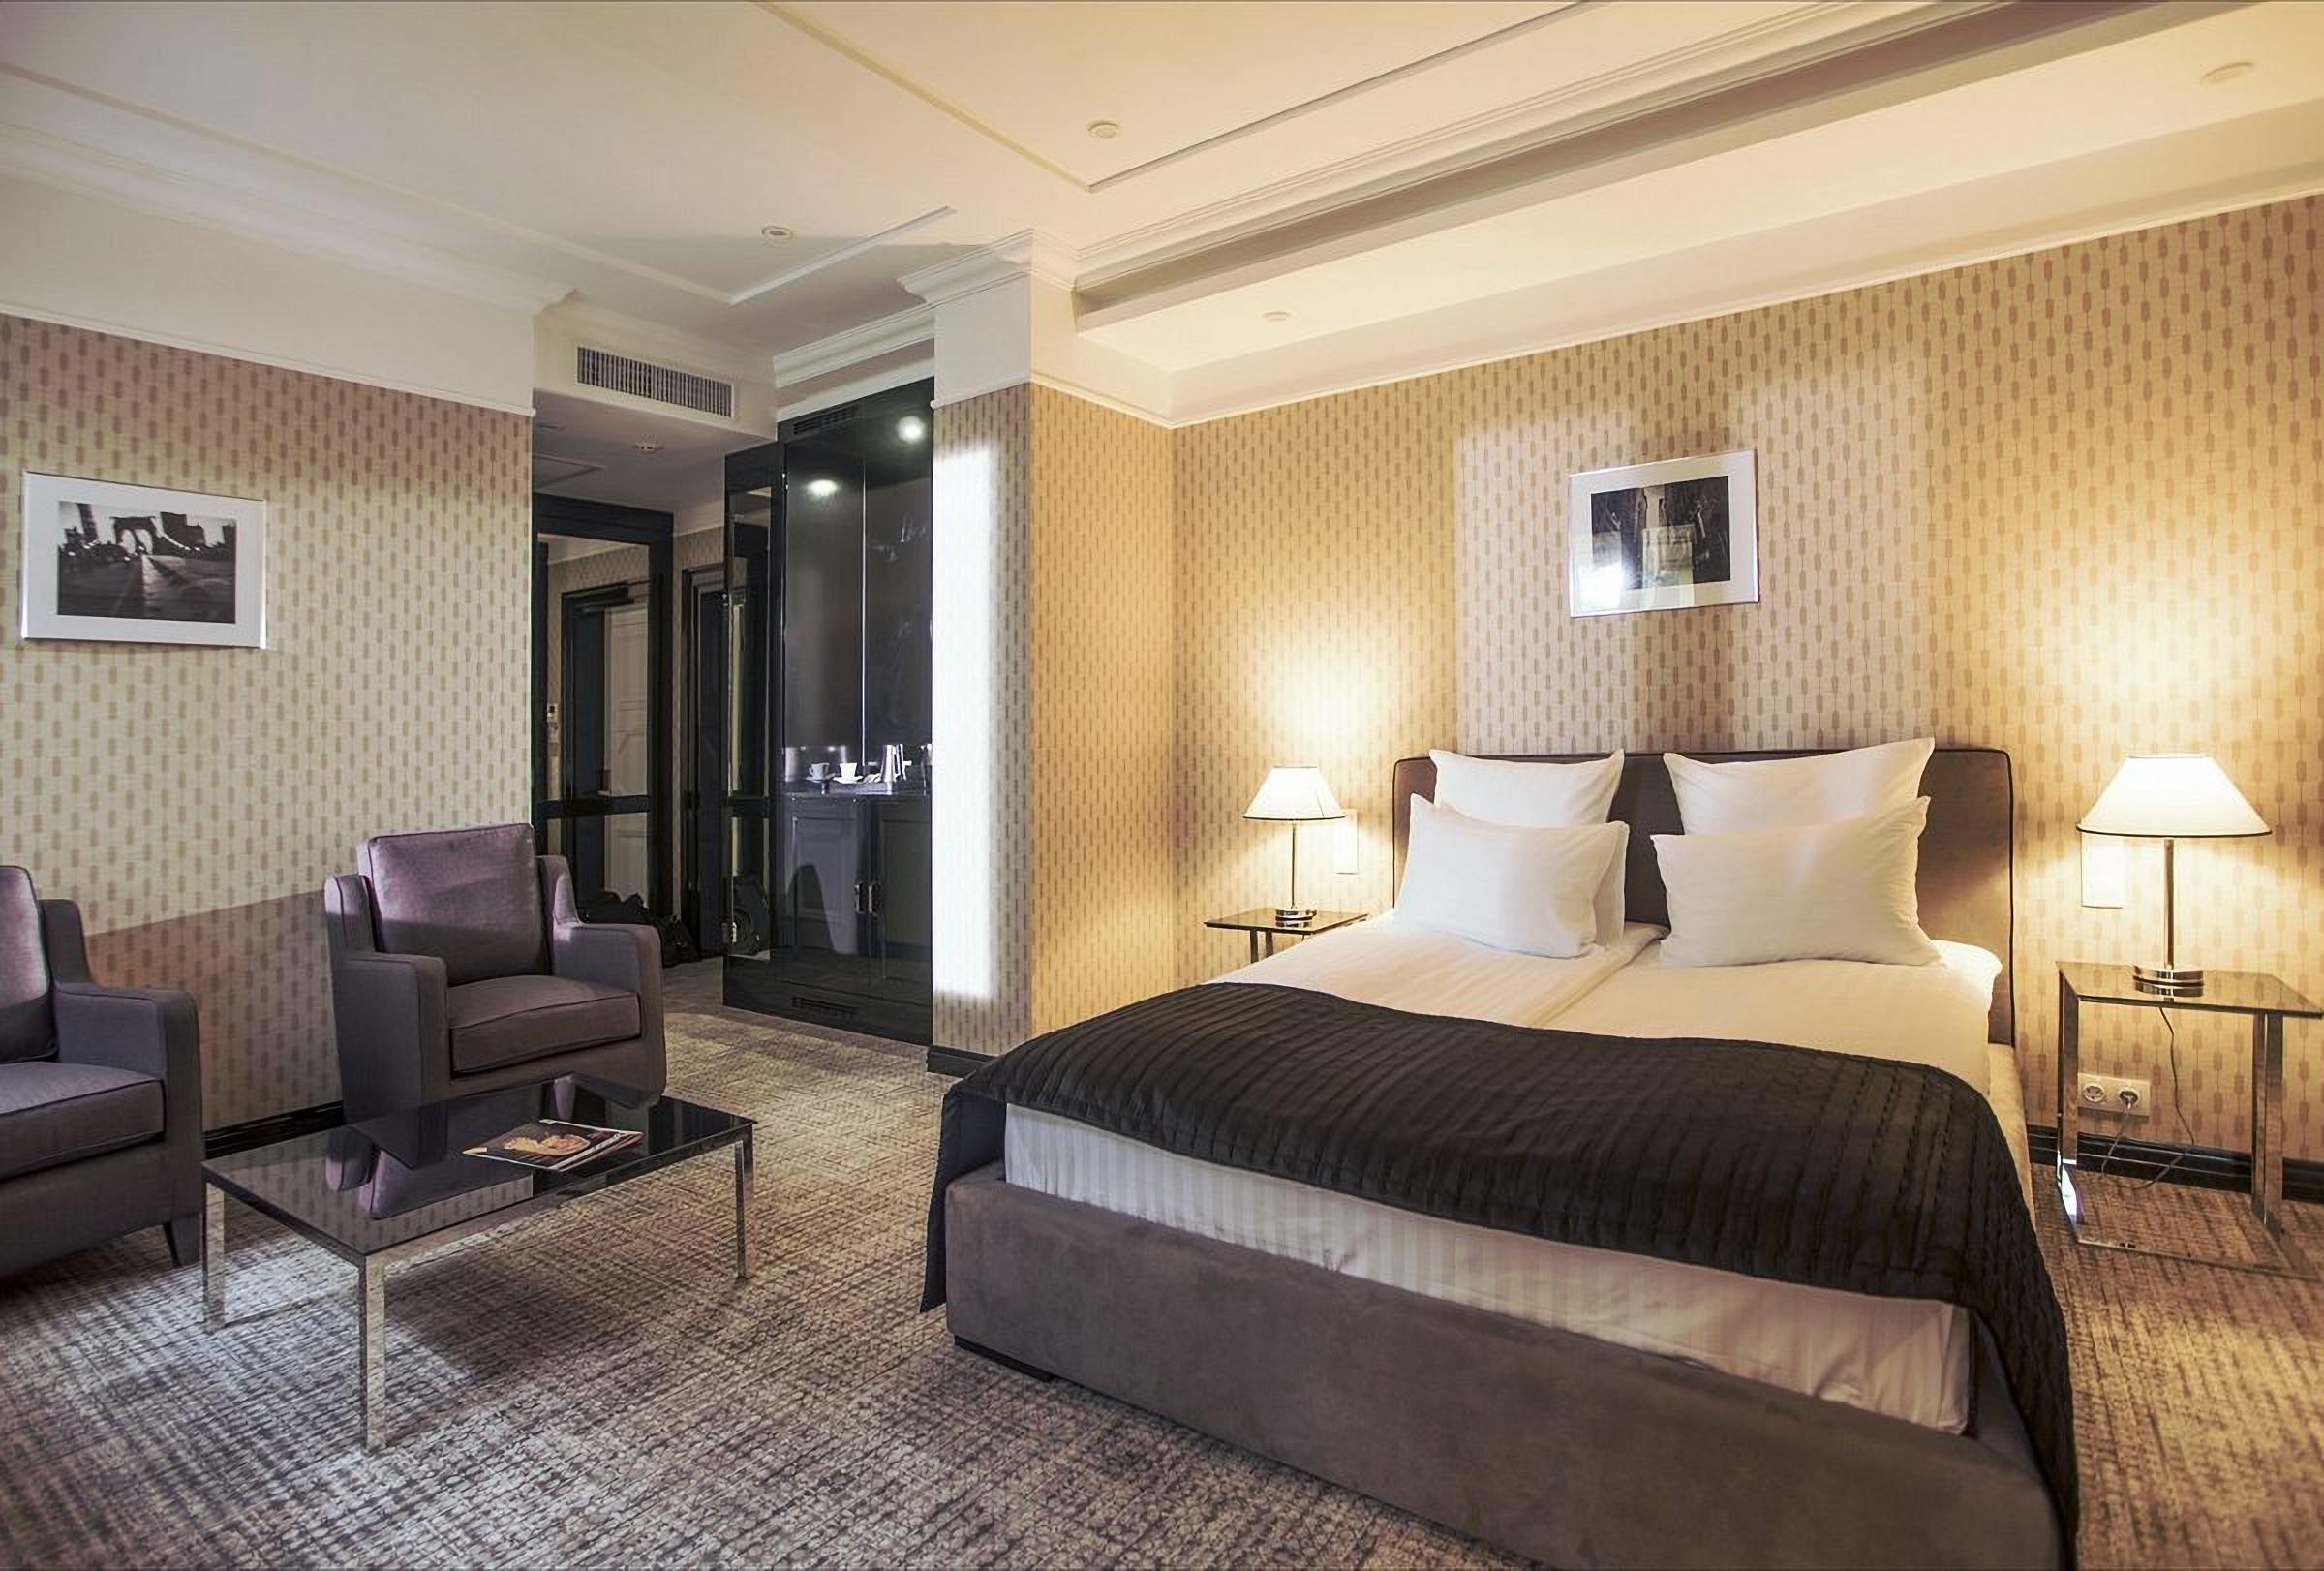 Room at the Wall Street Hotel Odessa Ukraine